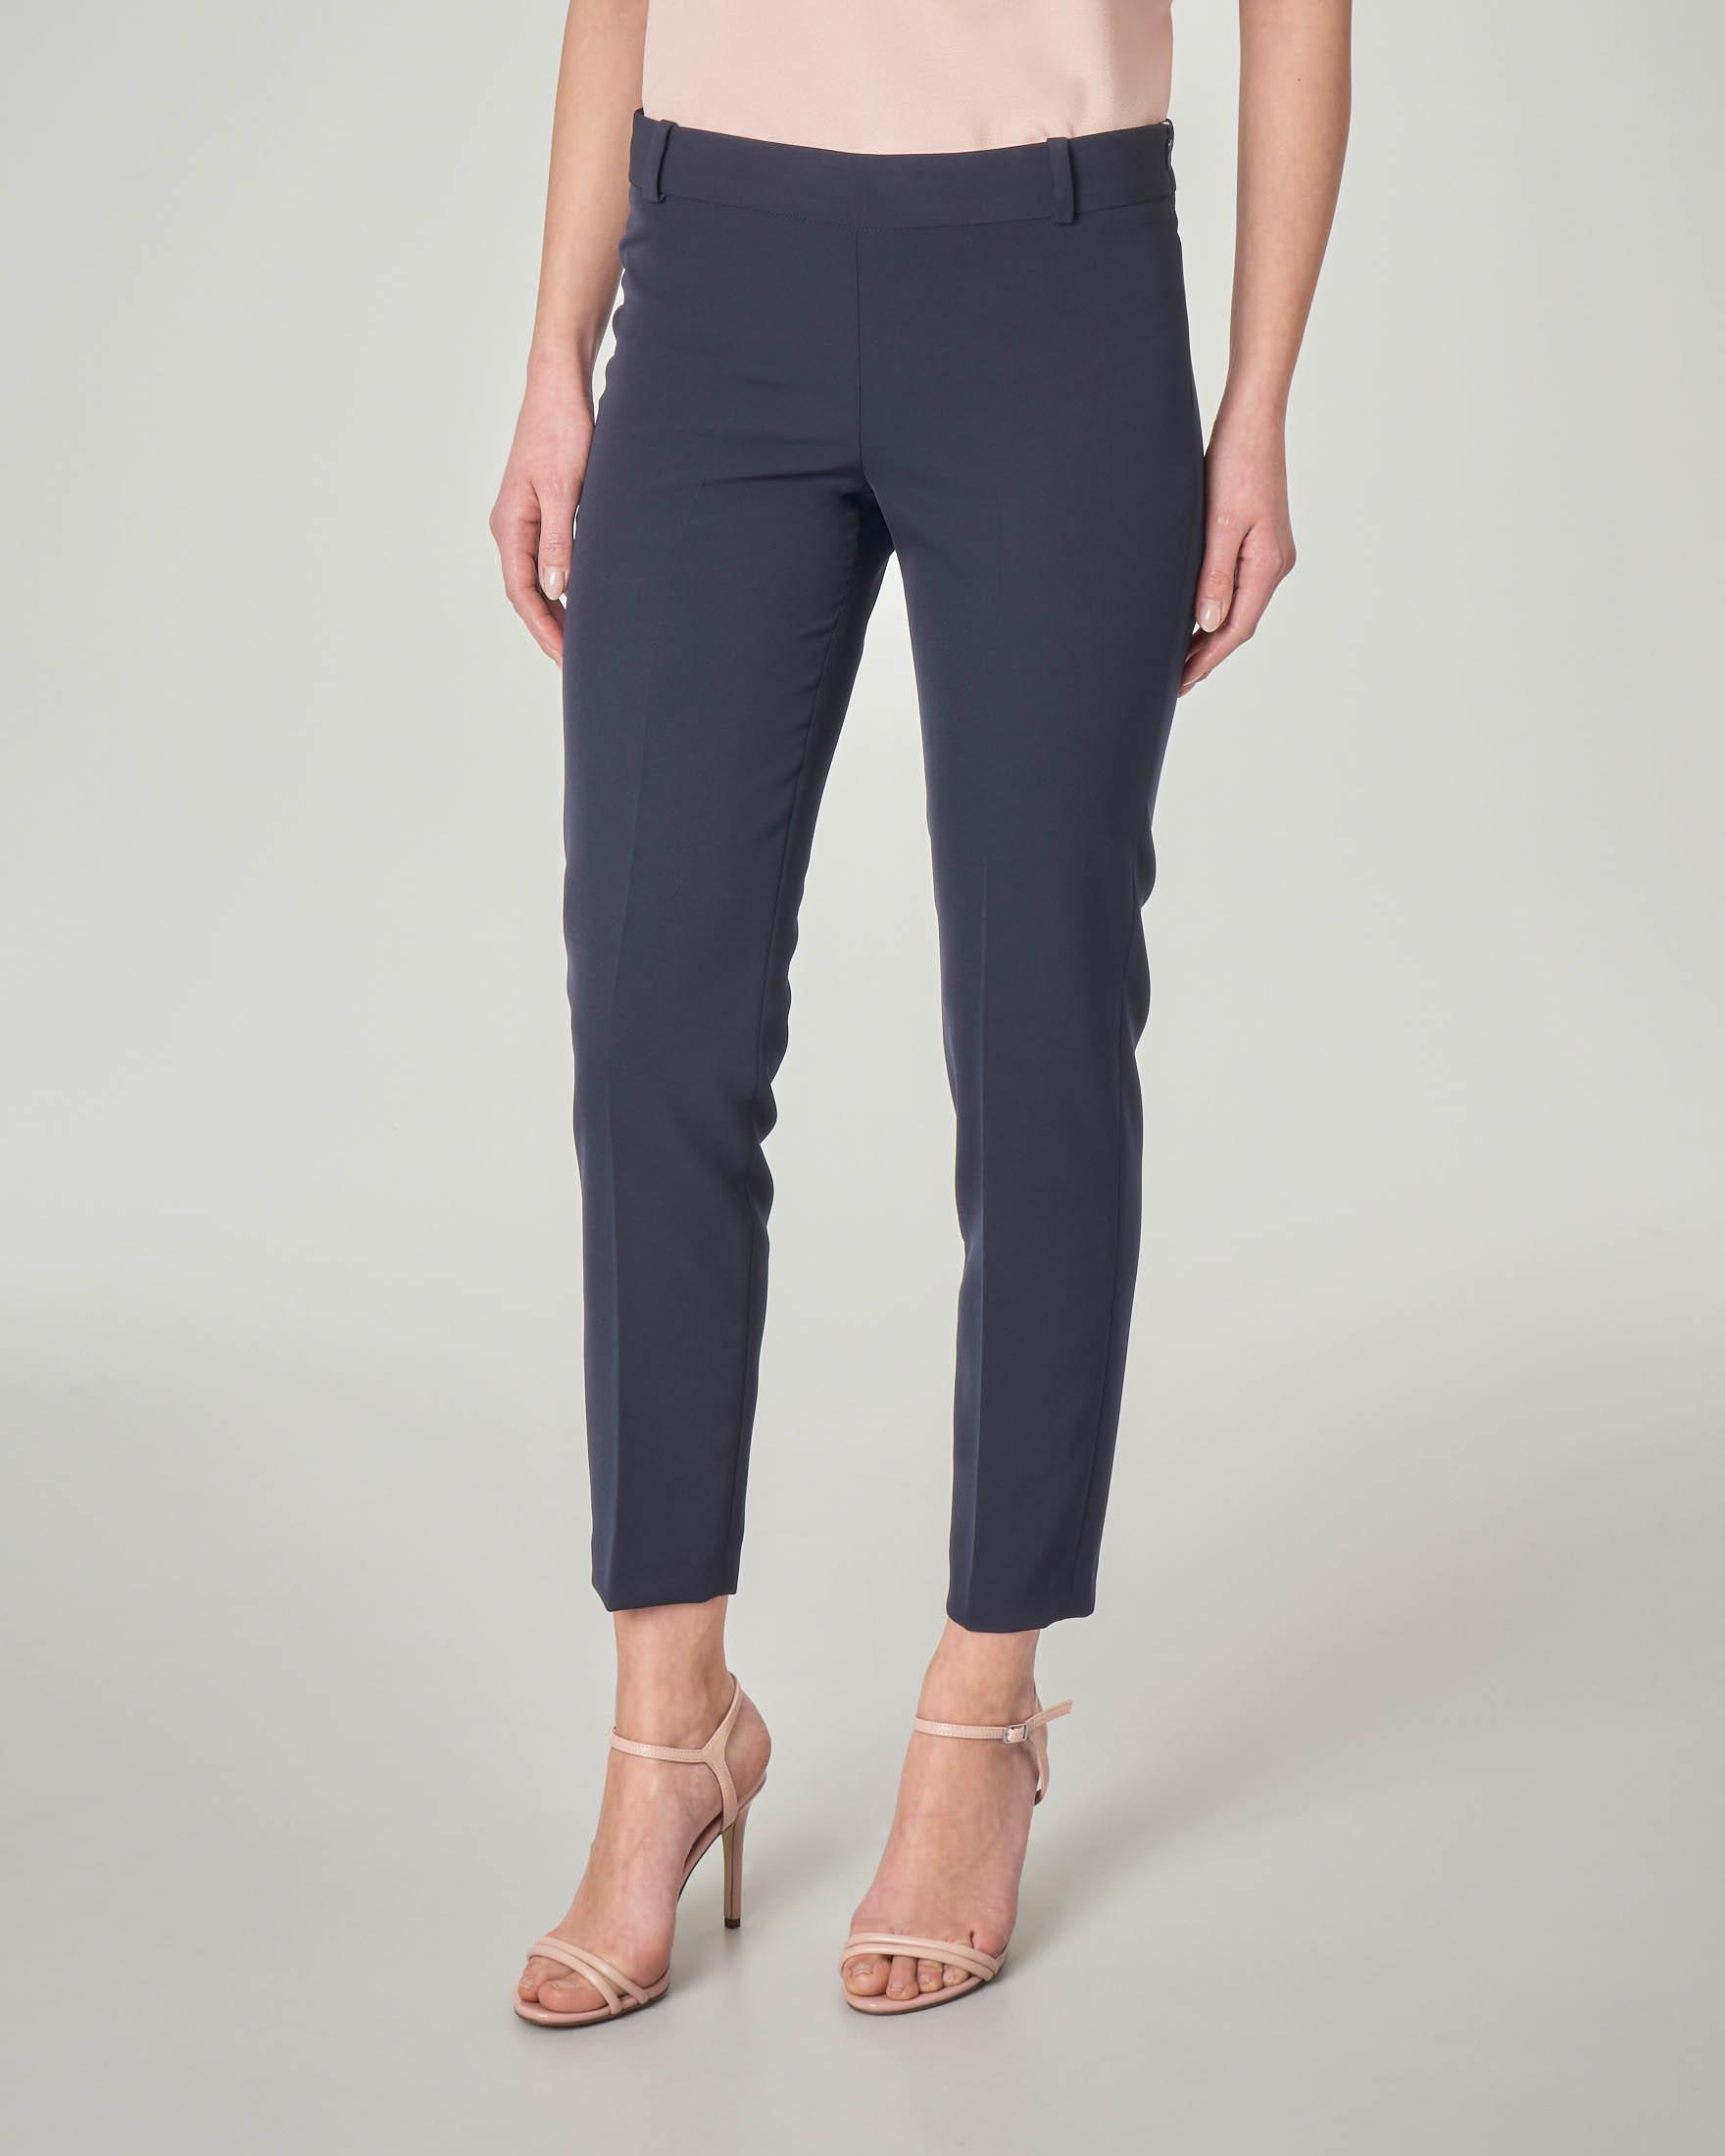 Pantalone blu in cady lunghezza alla caviglia